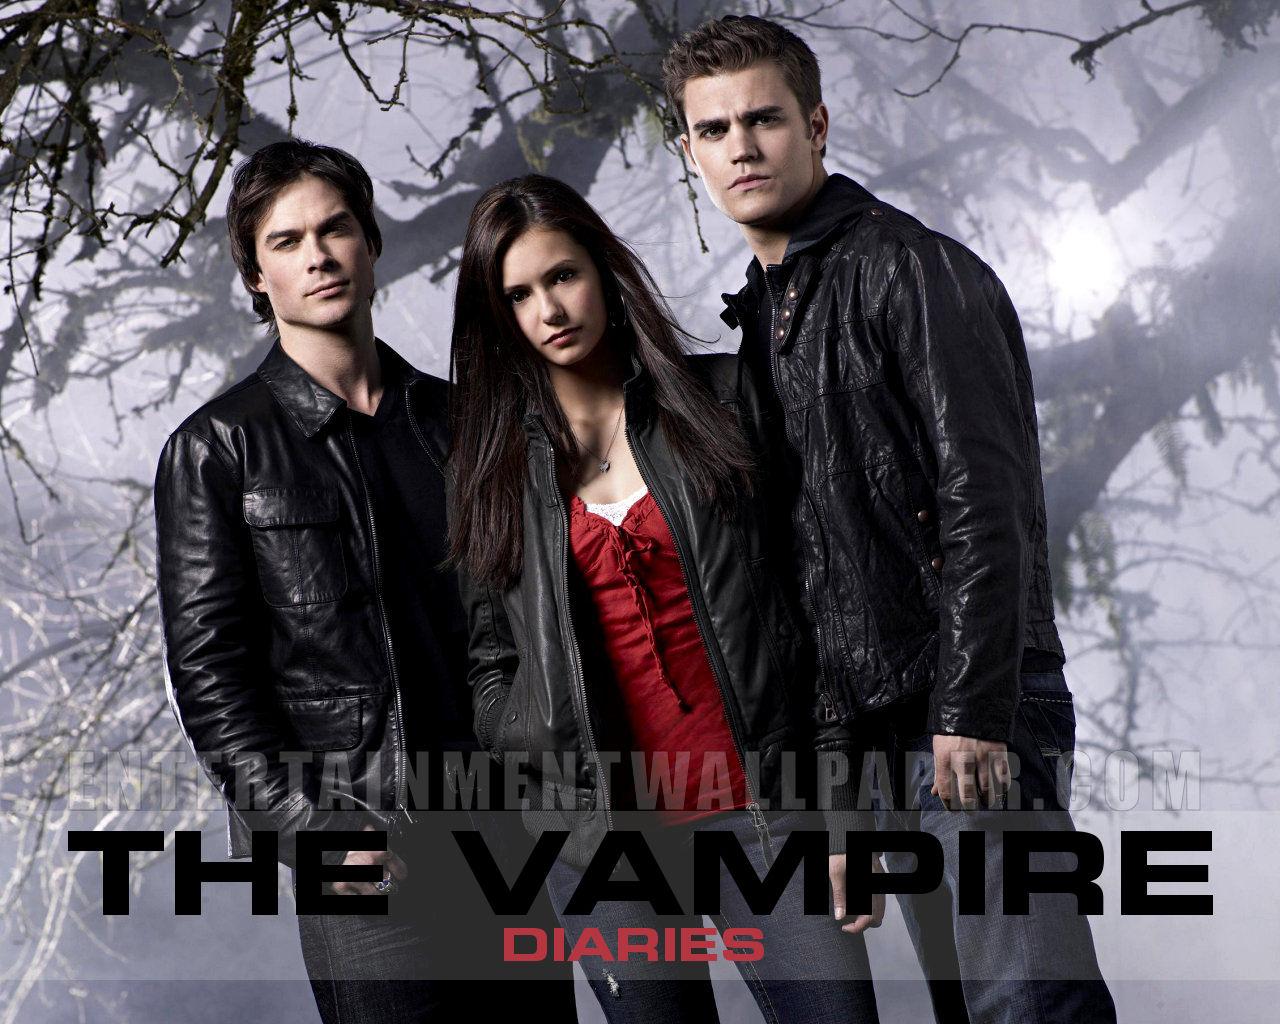 http://4.bp.blogspot.com/-mnIyqgVAnqQ/TY9Qm7KU0lI/AAAAAAAAAJk/12-T2QtVeLc/s1600/tv_the_vampire_diaries01.jpg